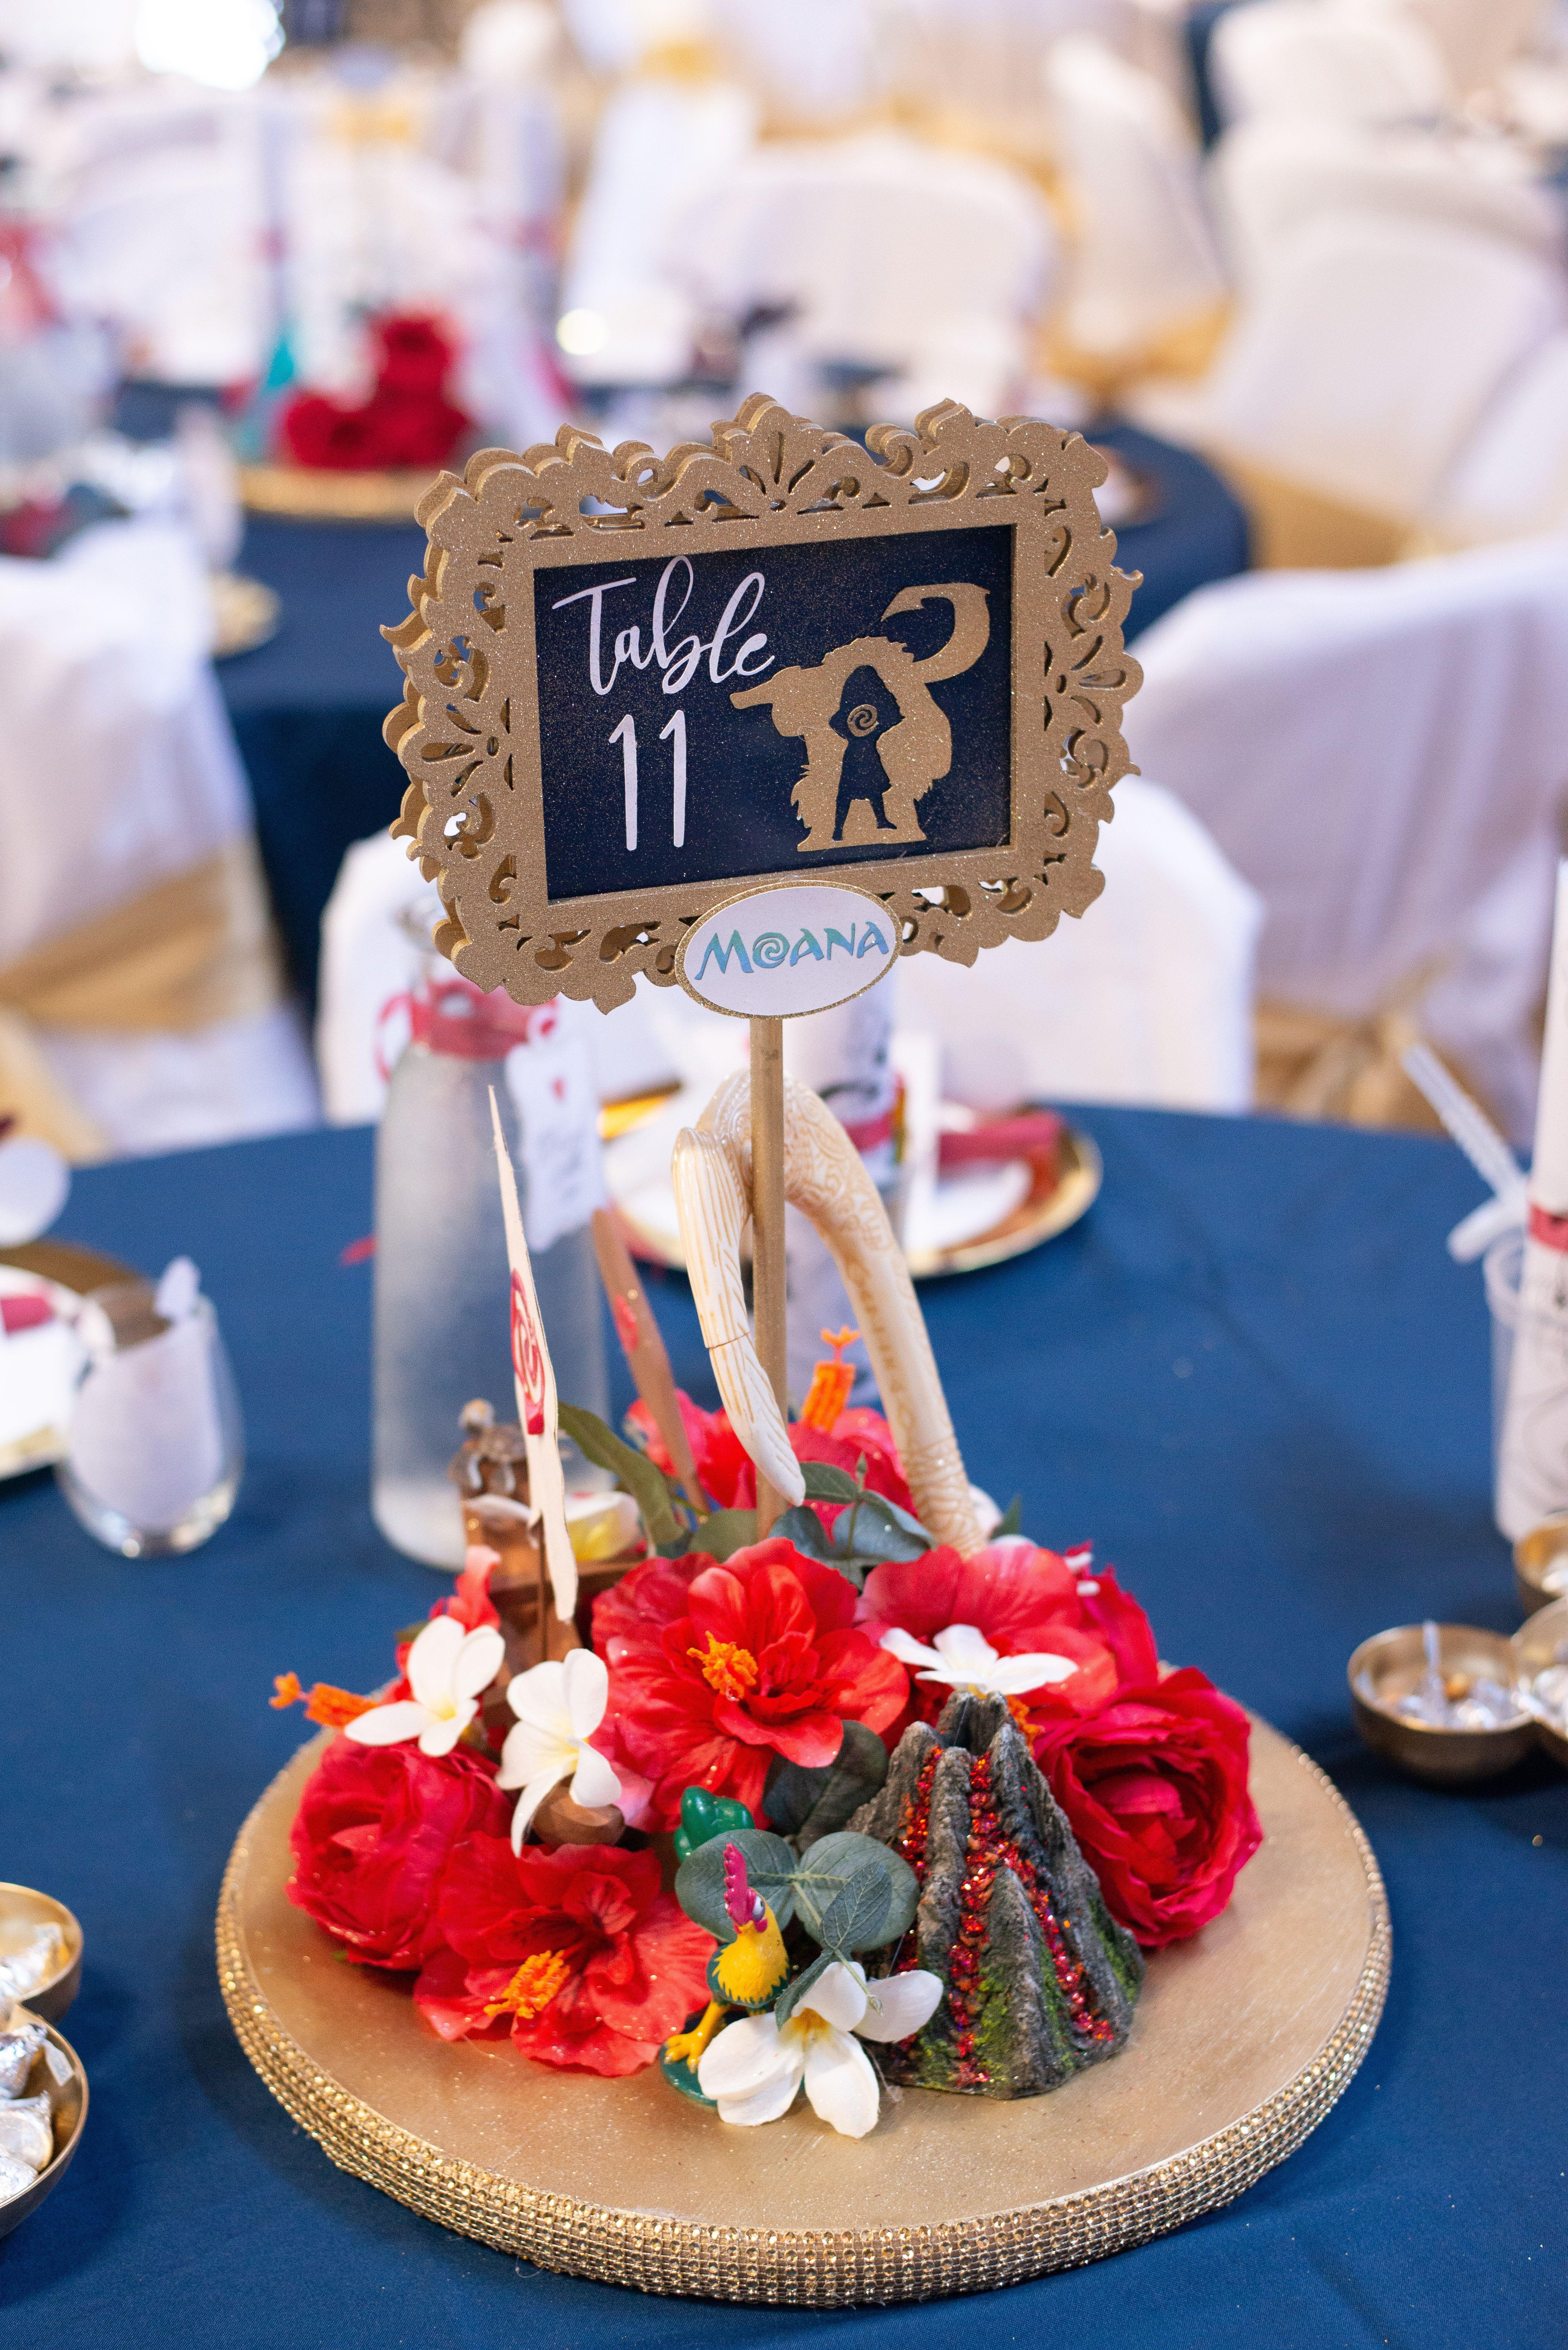 Disney Wedding Centerpiece - Moana | Disney wedding ...